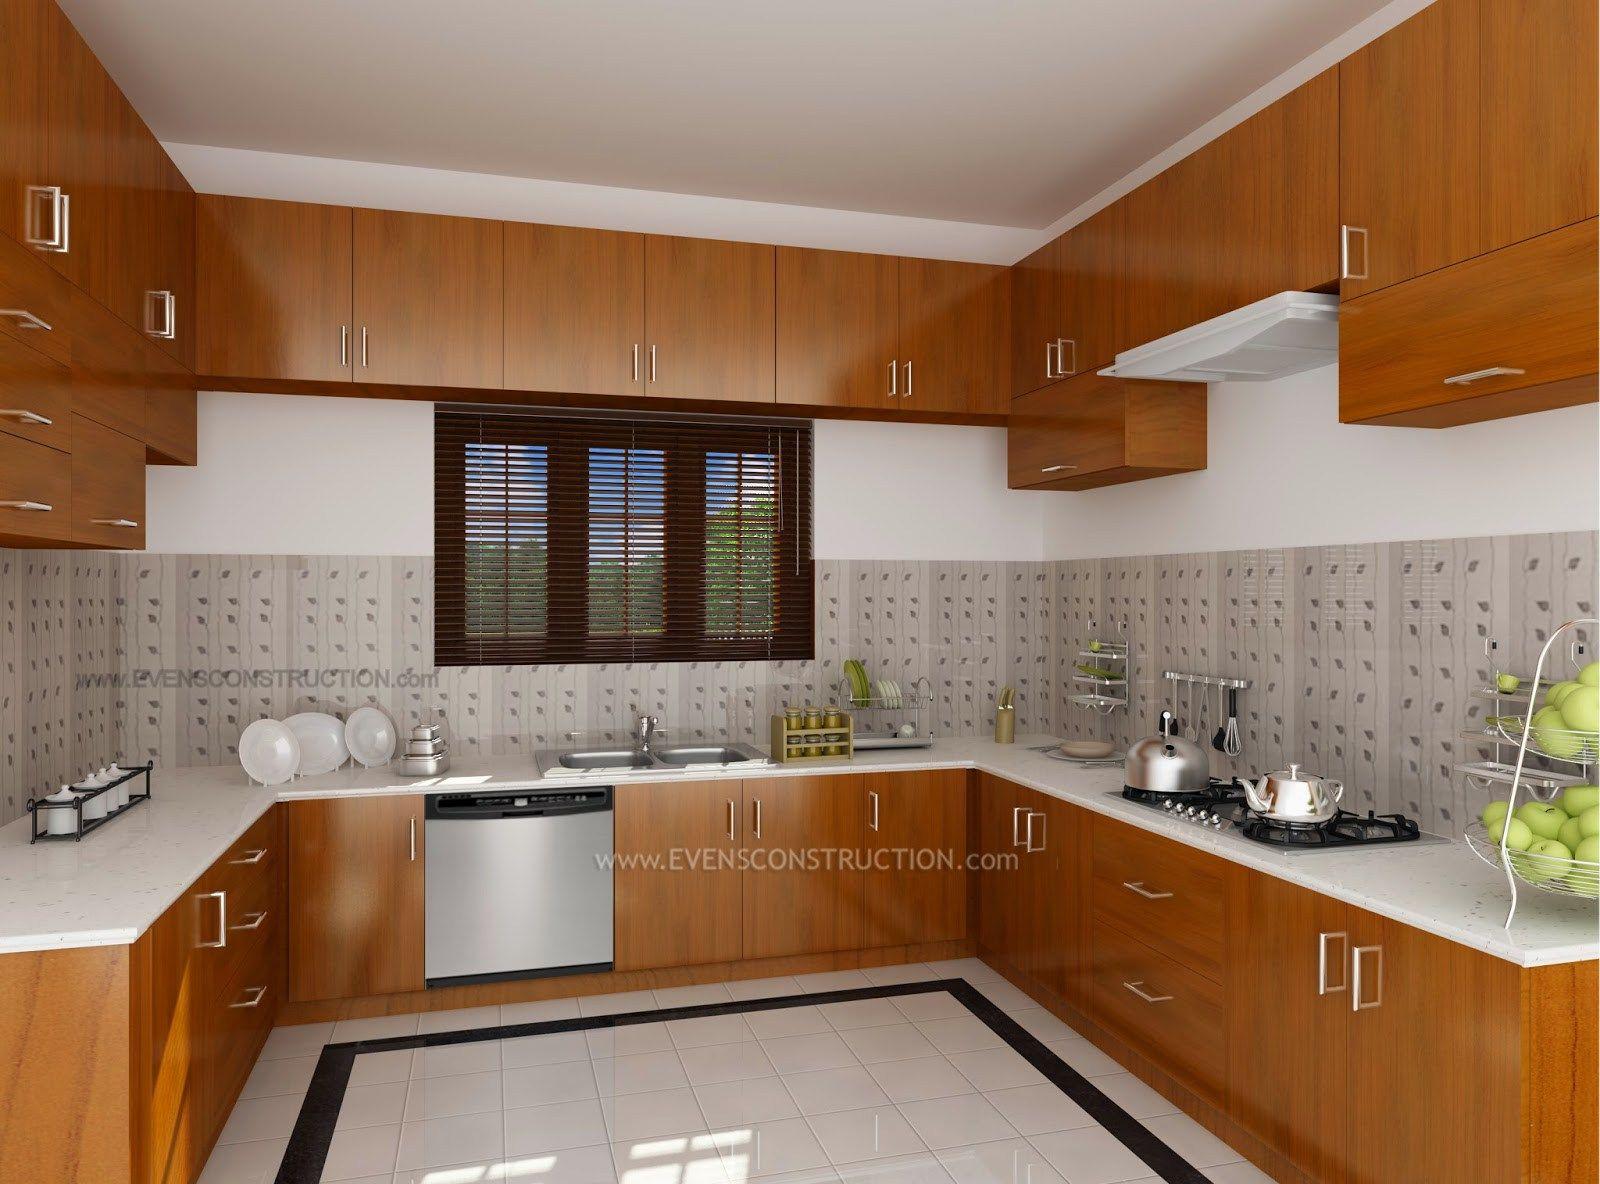 Kitchen Cabinet Design In Kerala Ideasidea